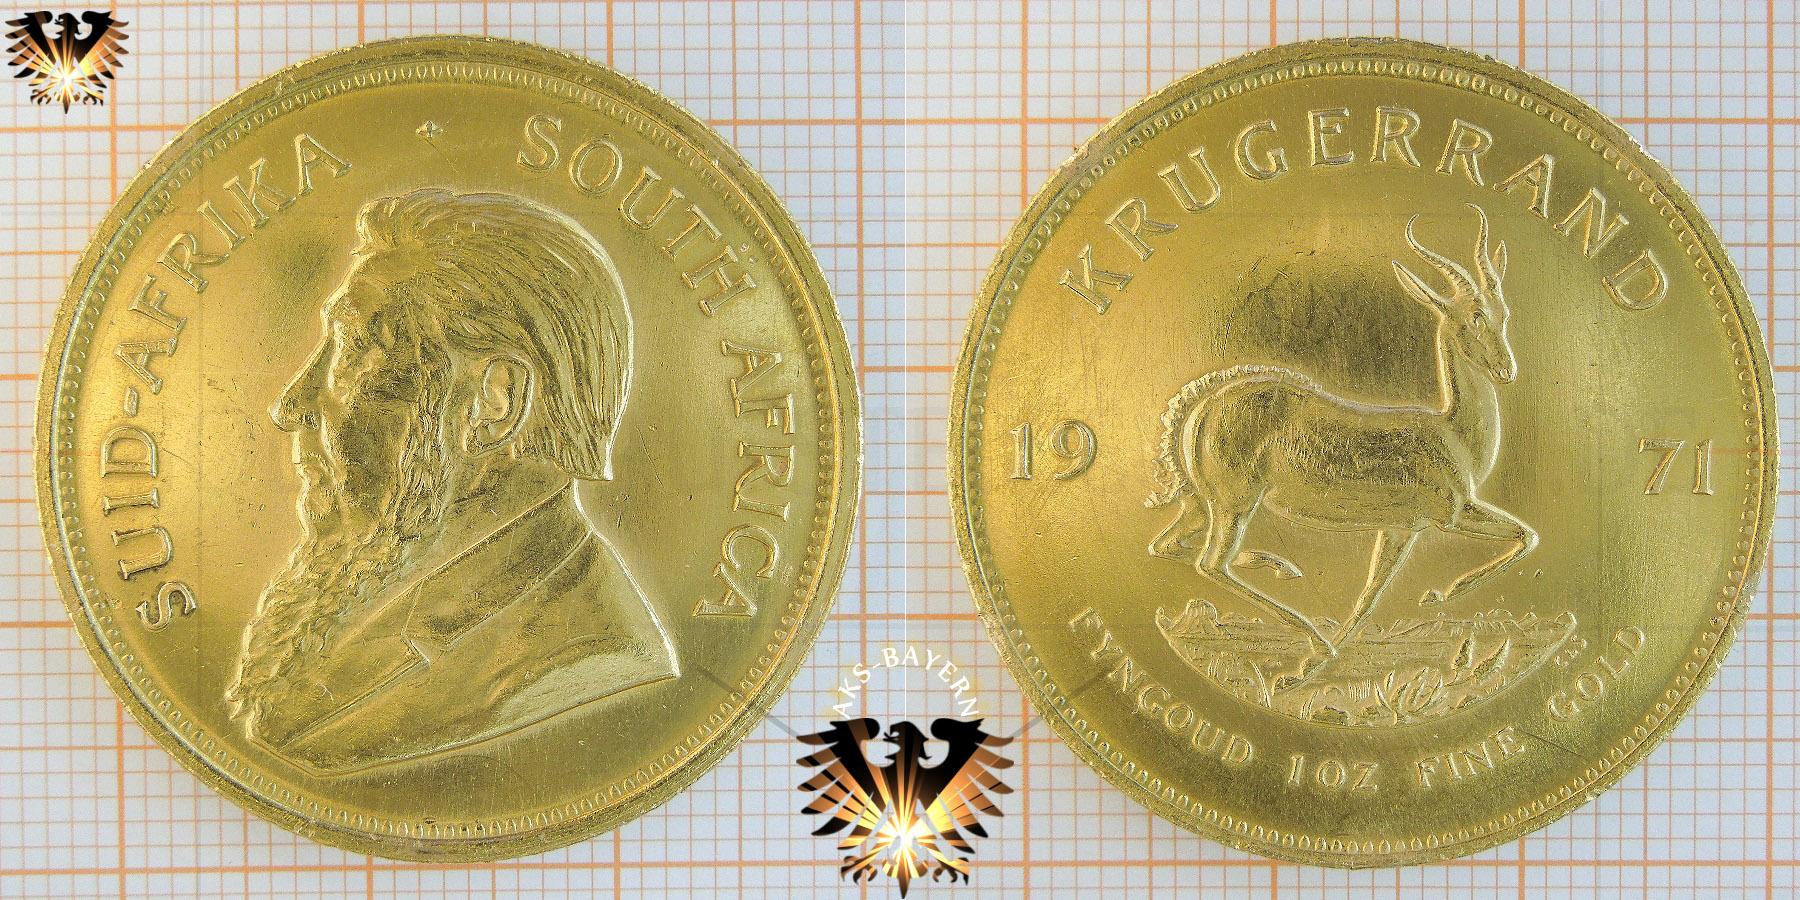 Bullionmünze: Krügerrand (Krugerrand), Suid Afrika, 1971, 1 oz Fine Gold © goldankaufstelle-bayern.de